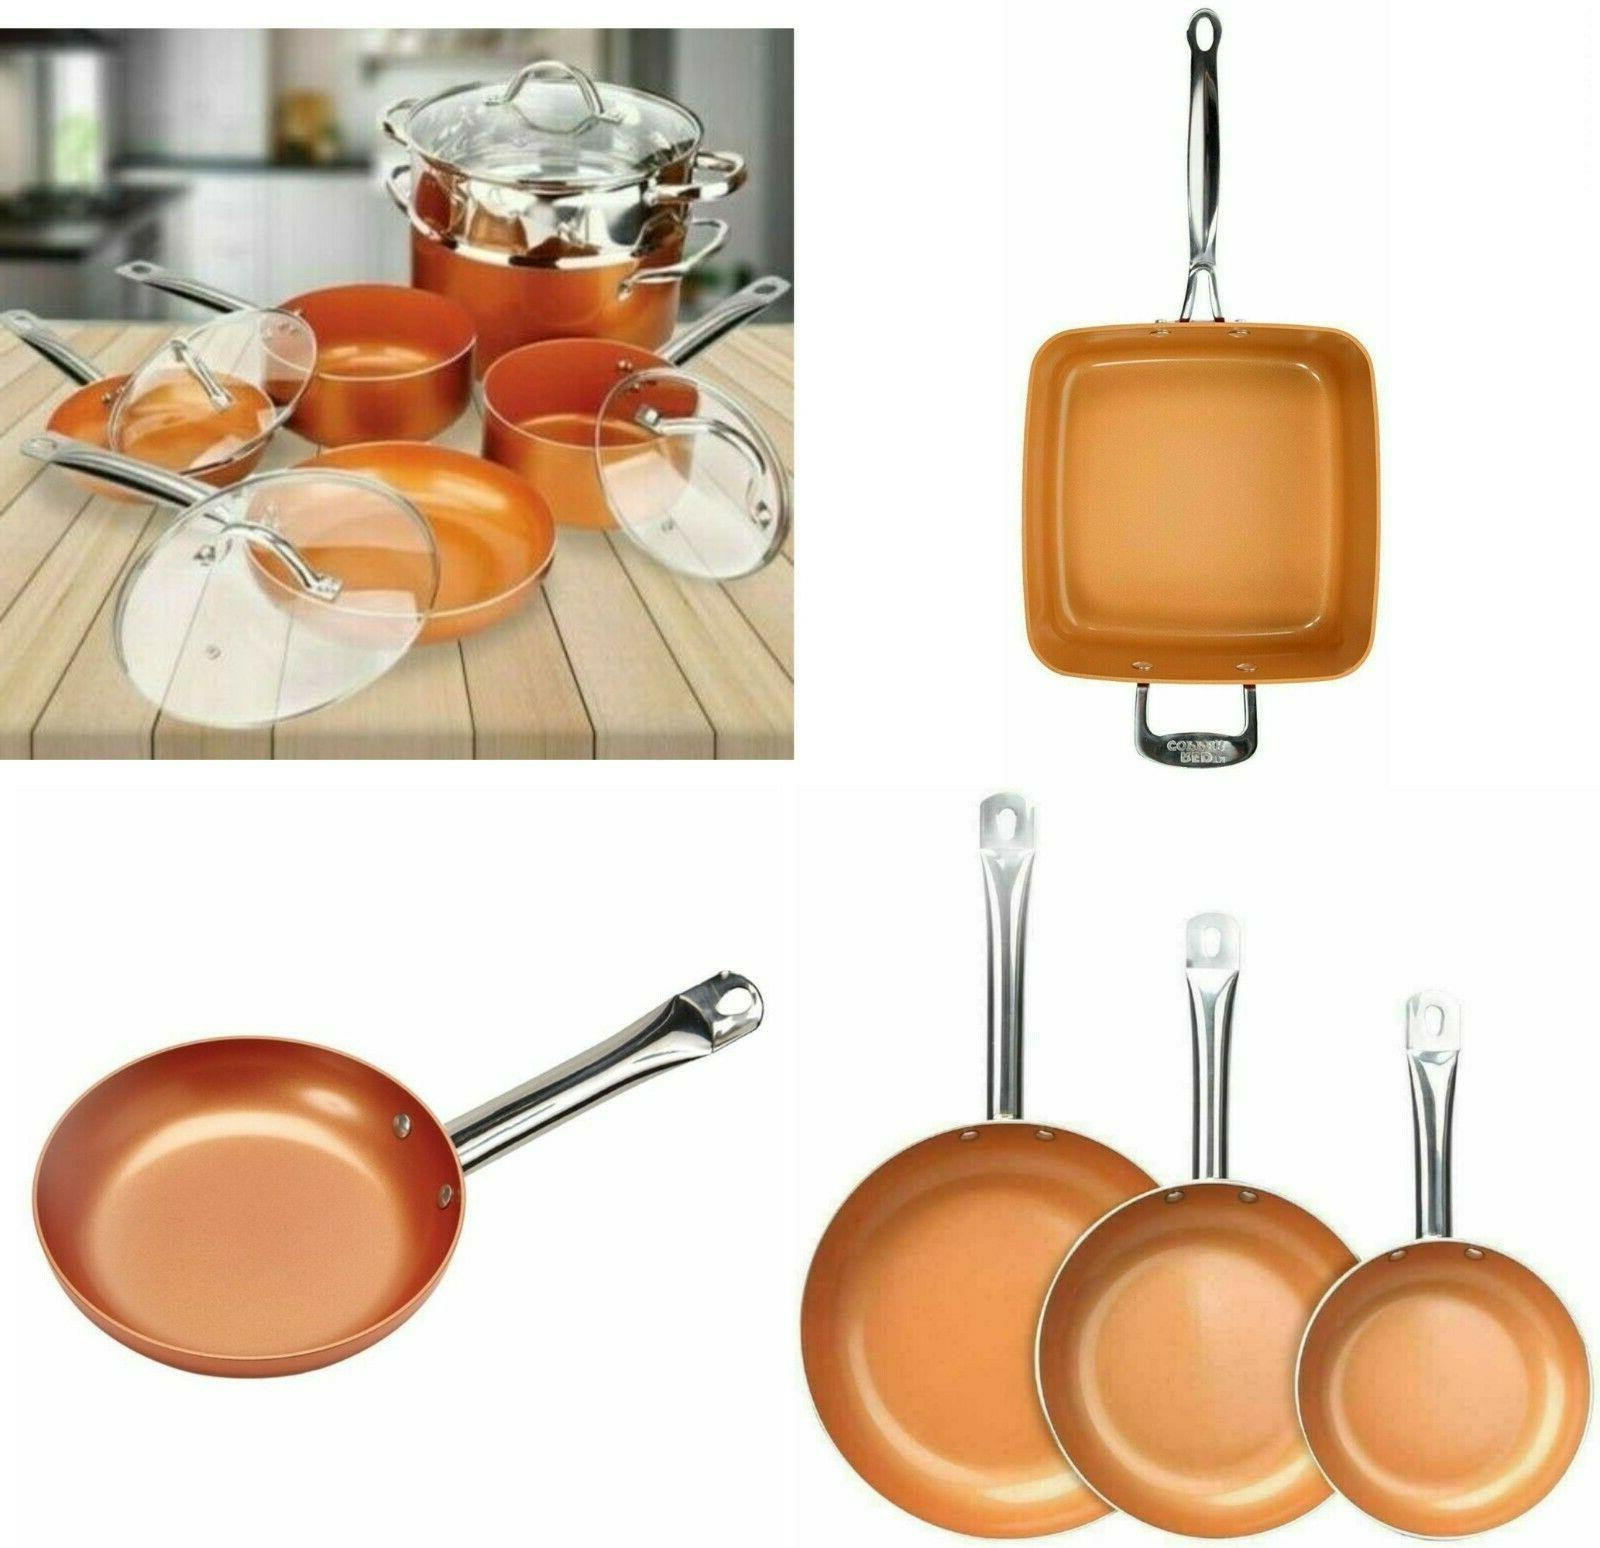 copper frying pan ceramic nonstick fry skillet